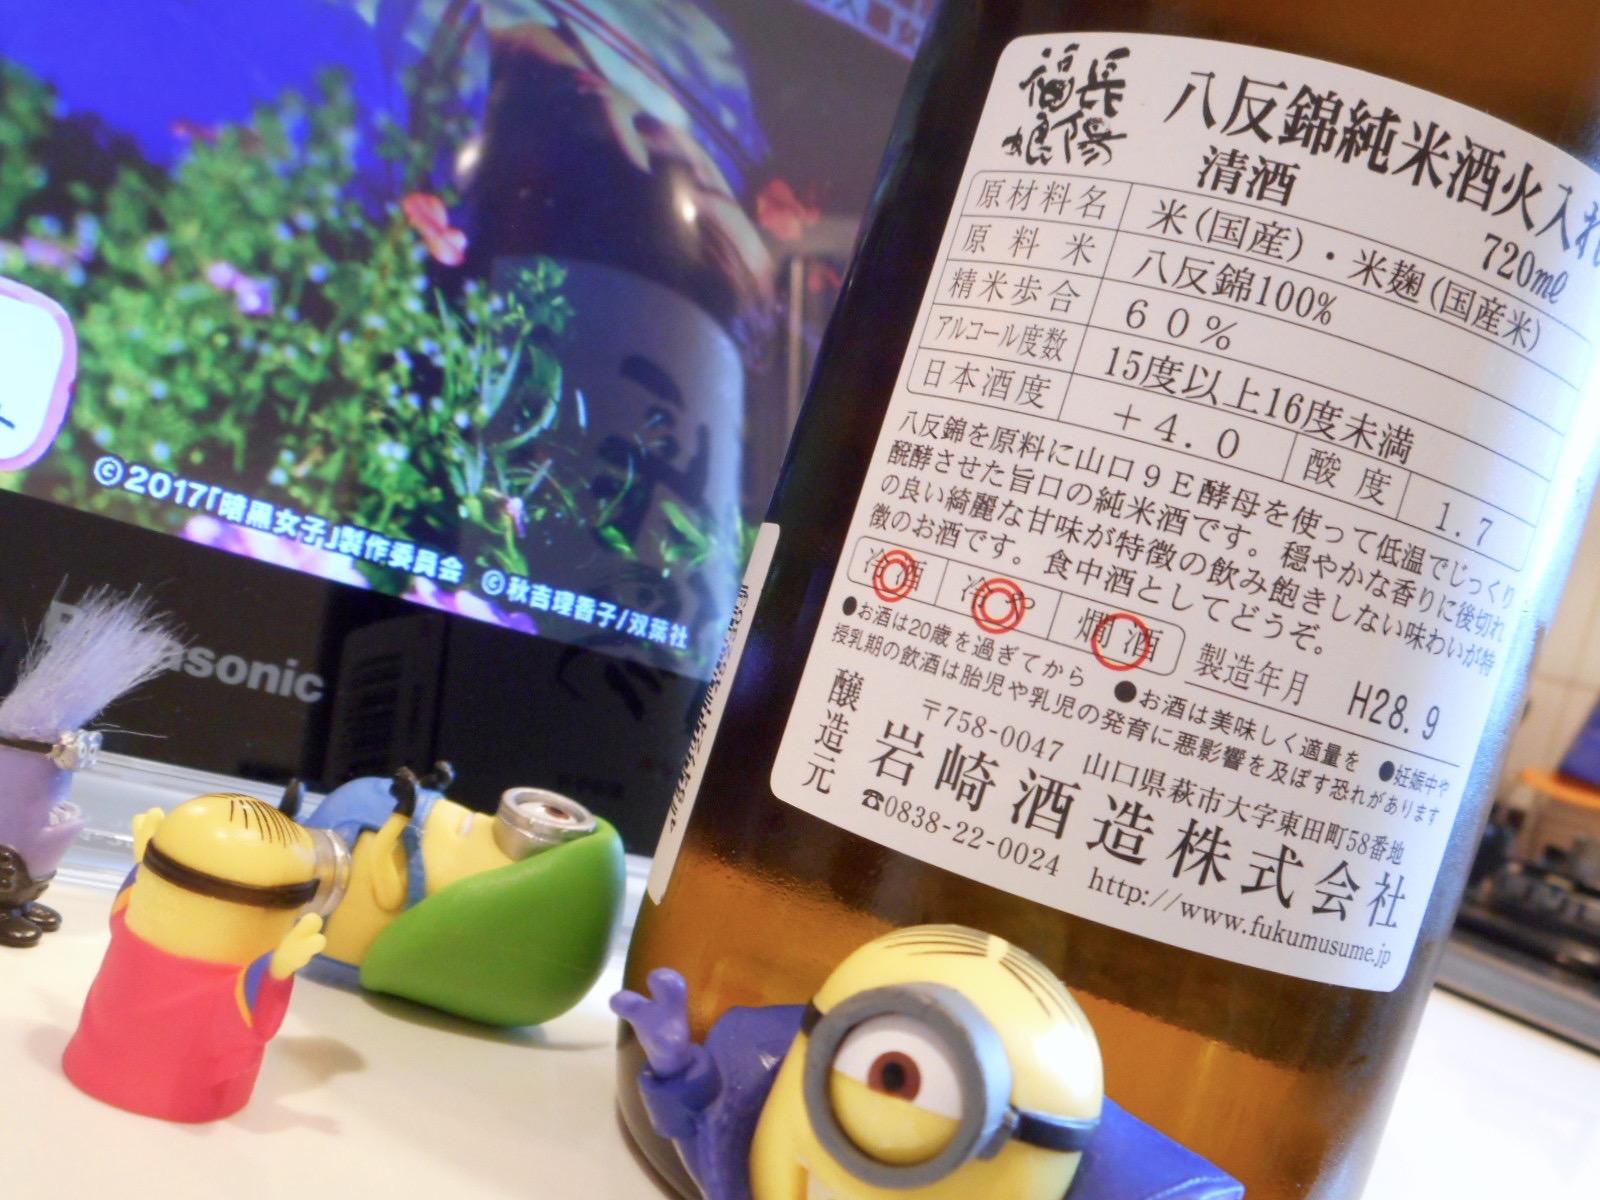 chouyoufukumusume_hattan_akiagari27by3.jpg